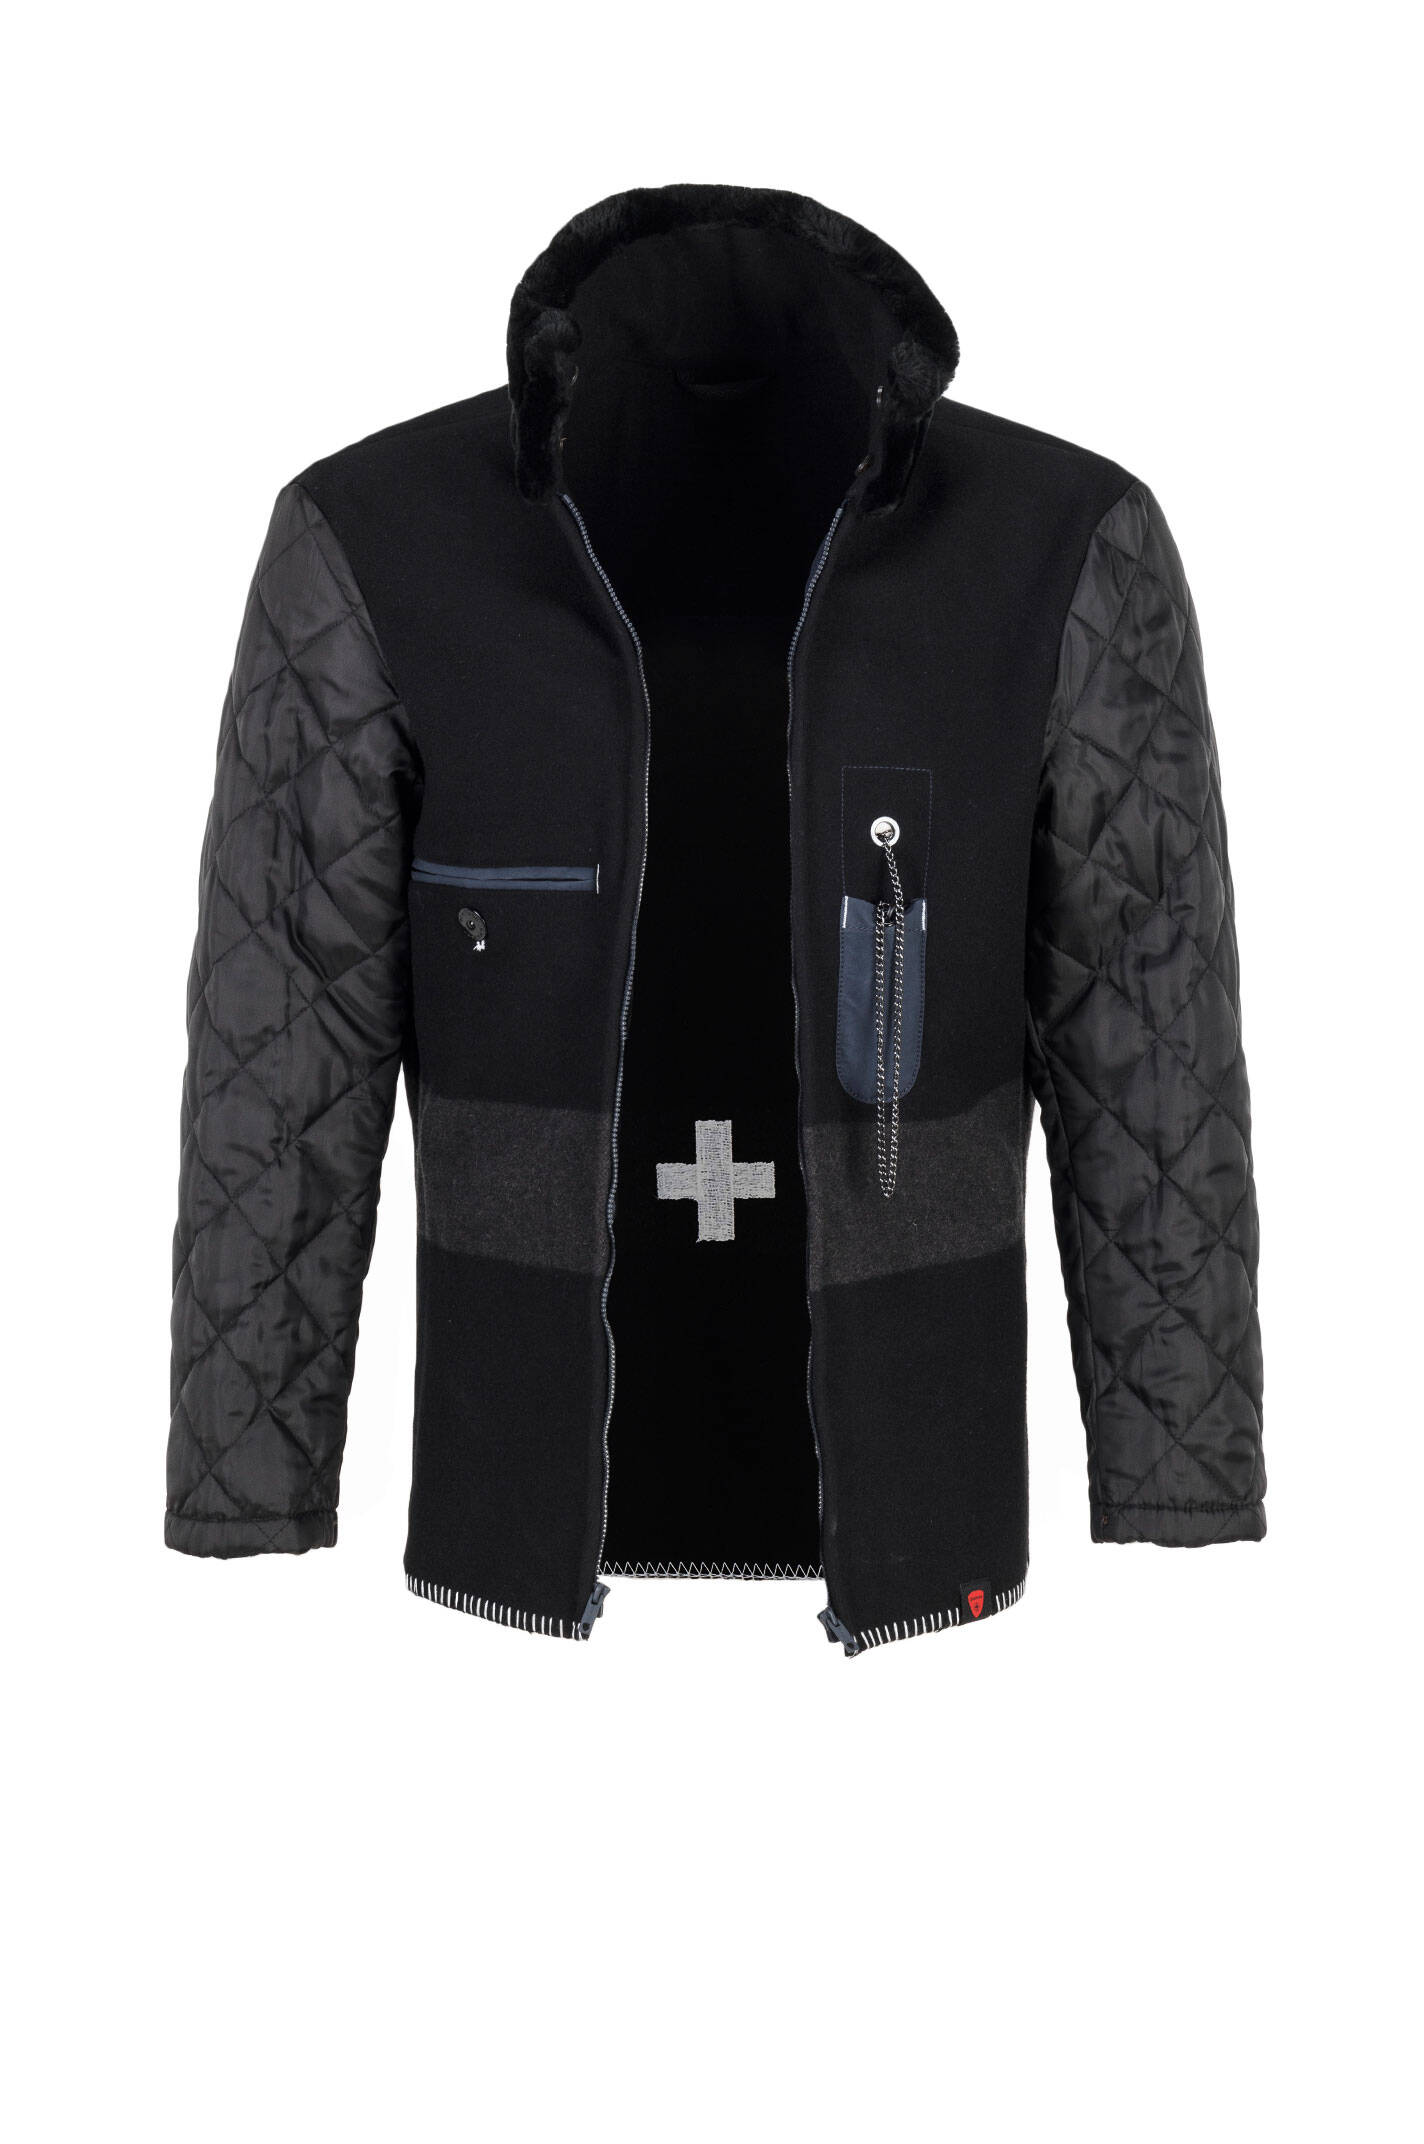 s c squad w jacket strellson navy blue outerwear. Black Bedroom Furniture Sets. Home Design Ideas